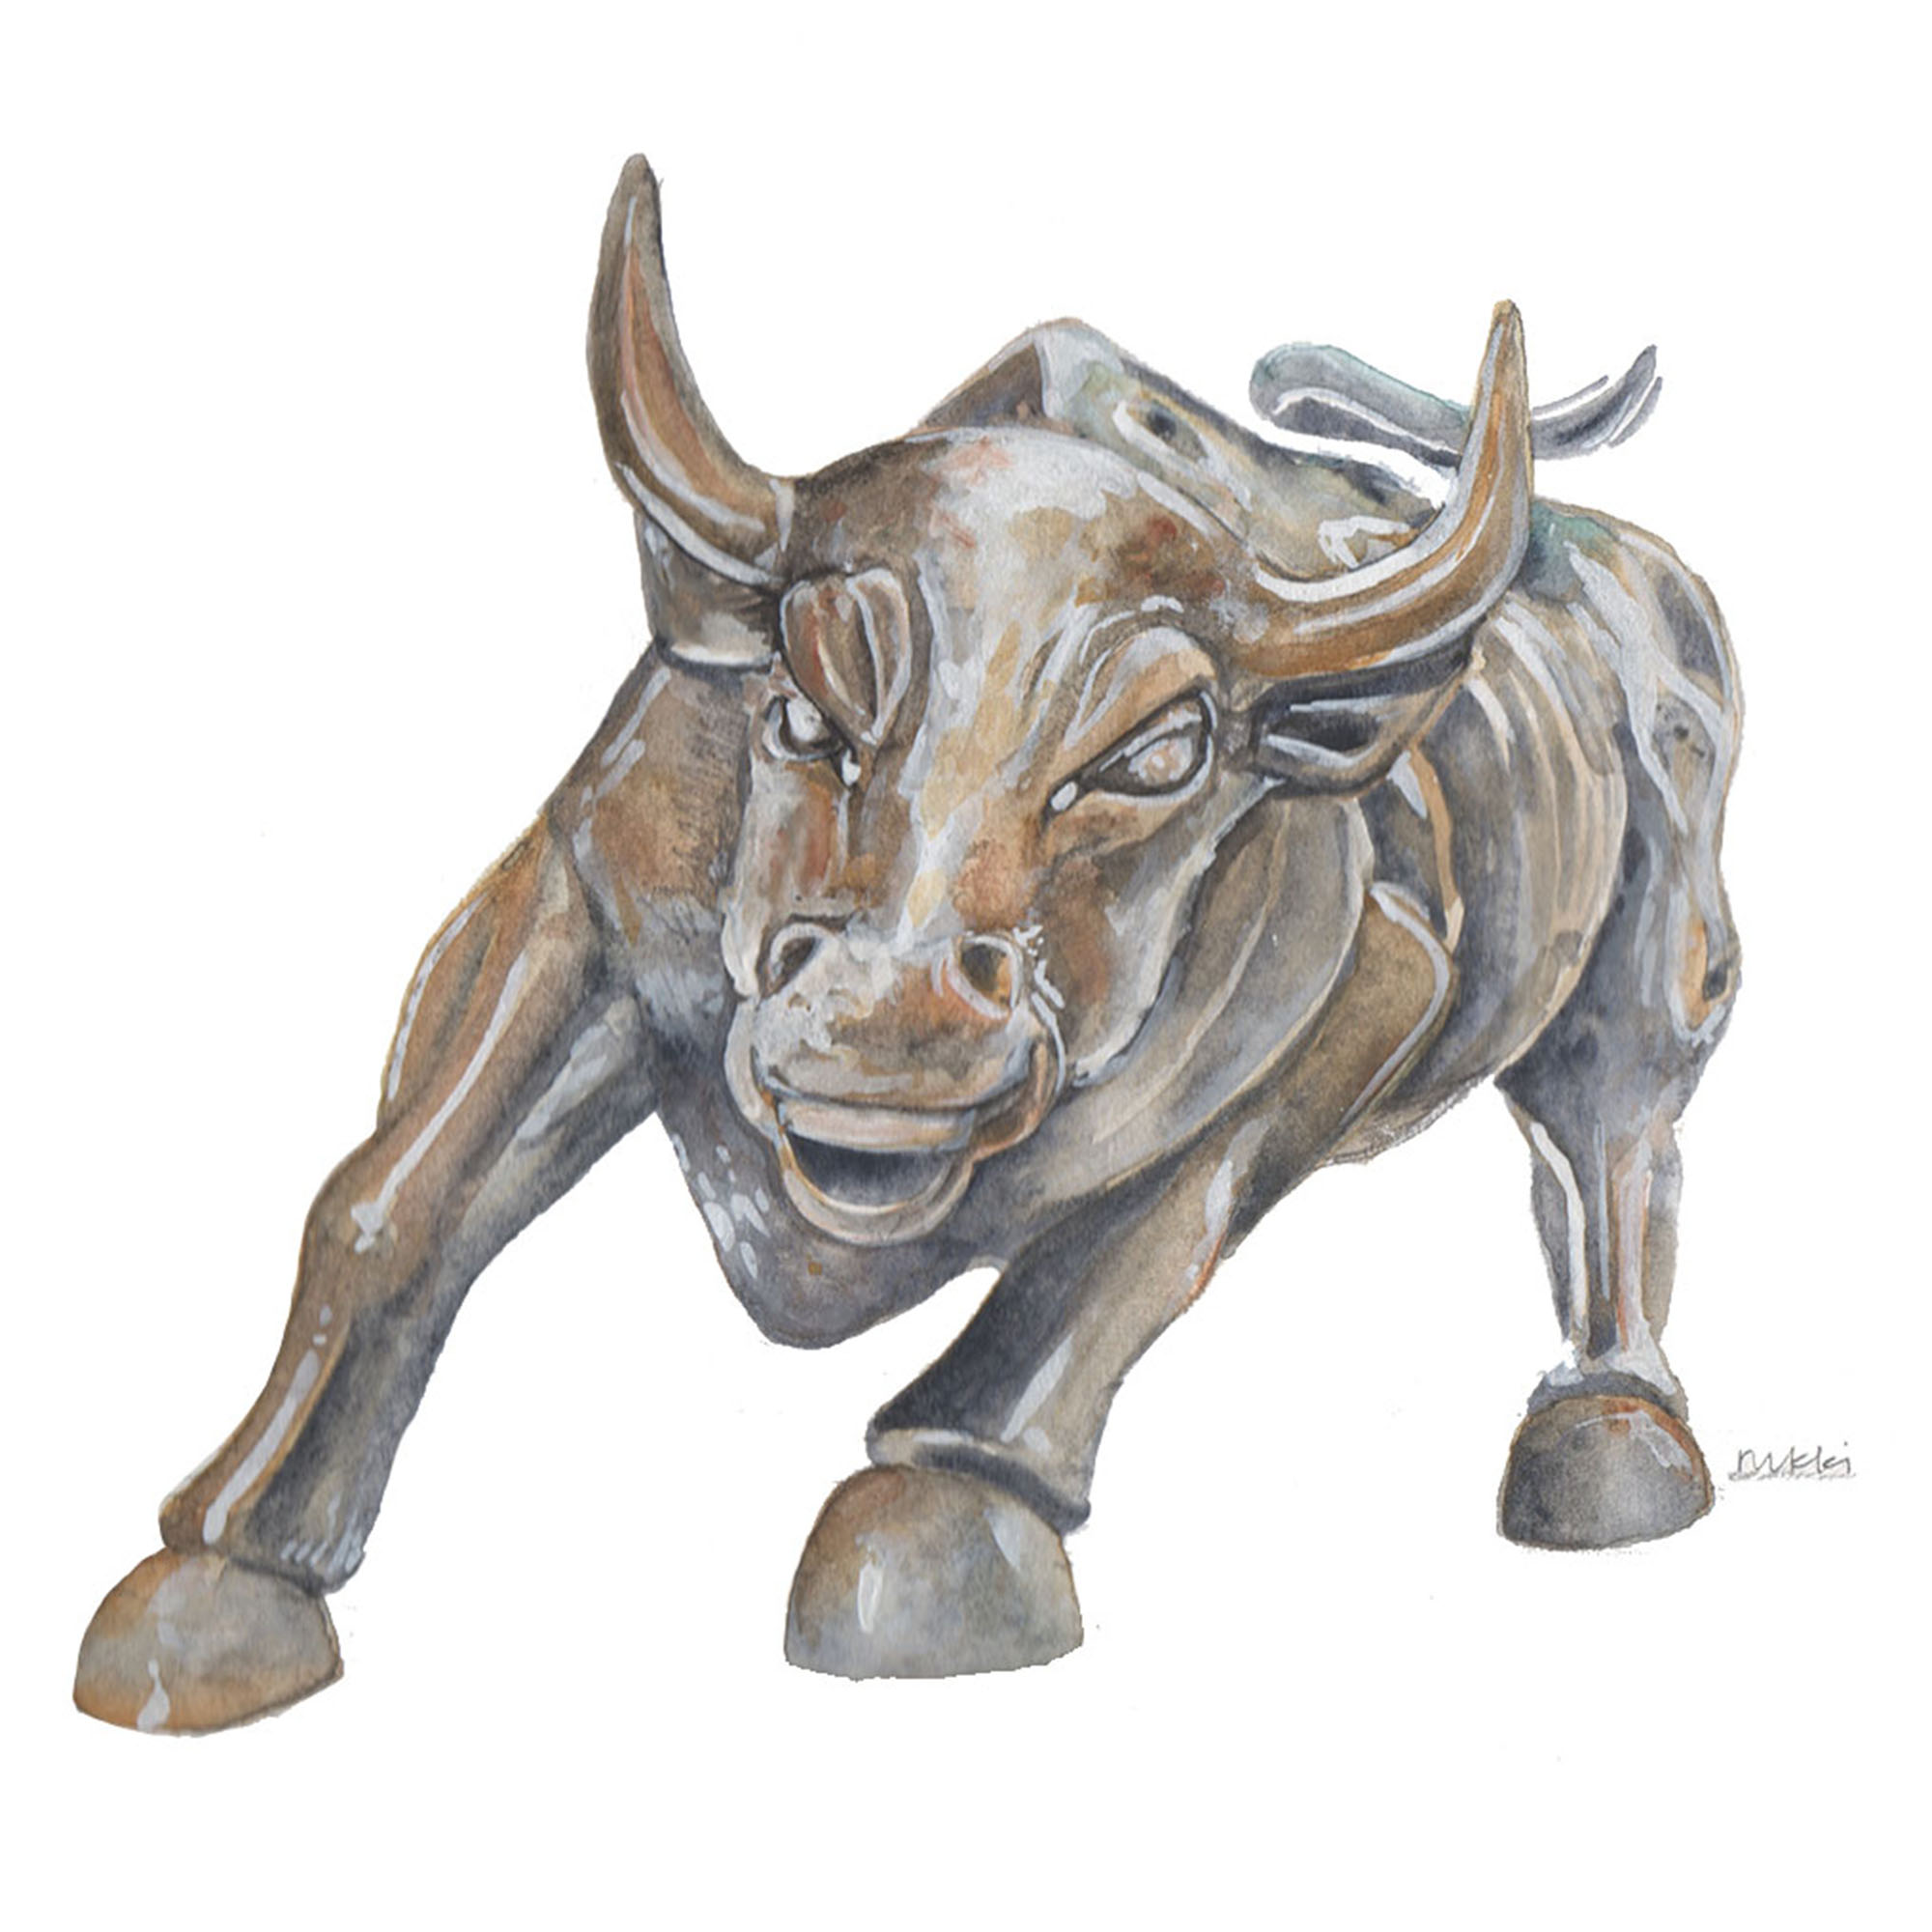 Charging Bull.jpeg